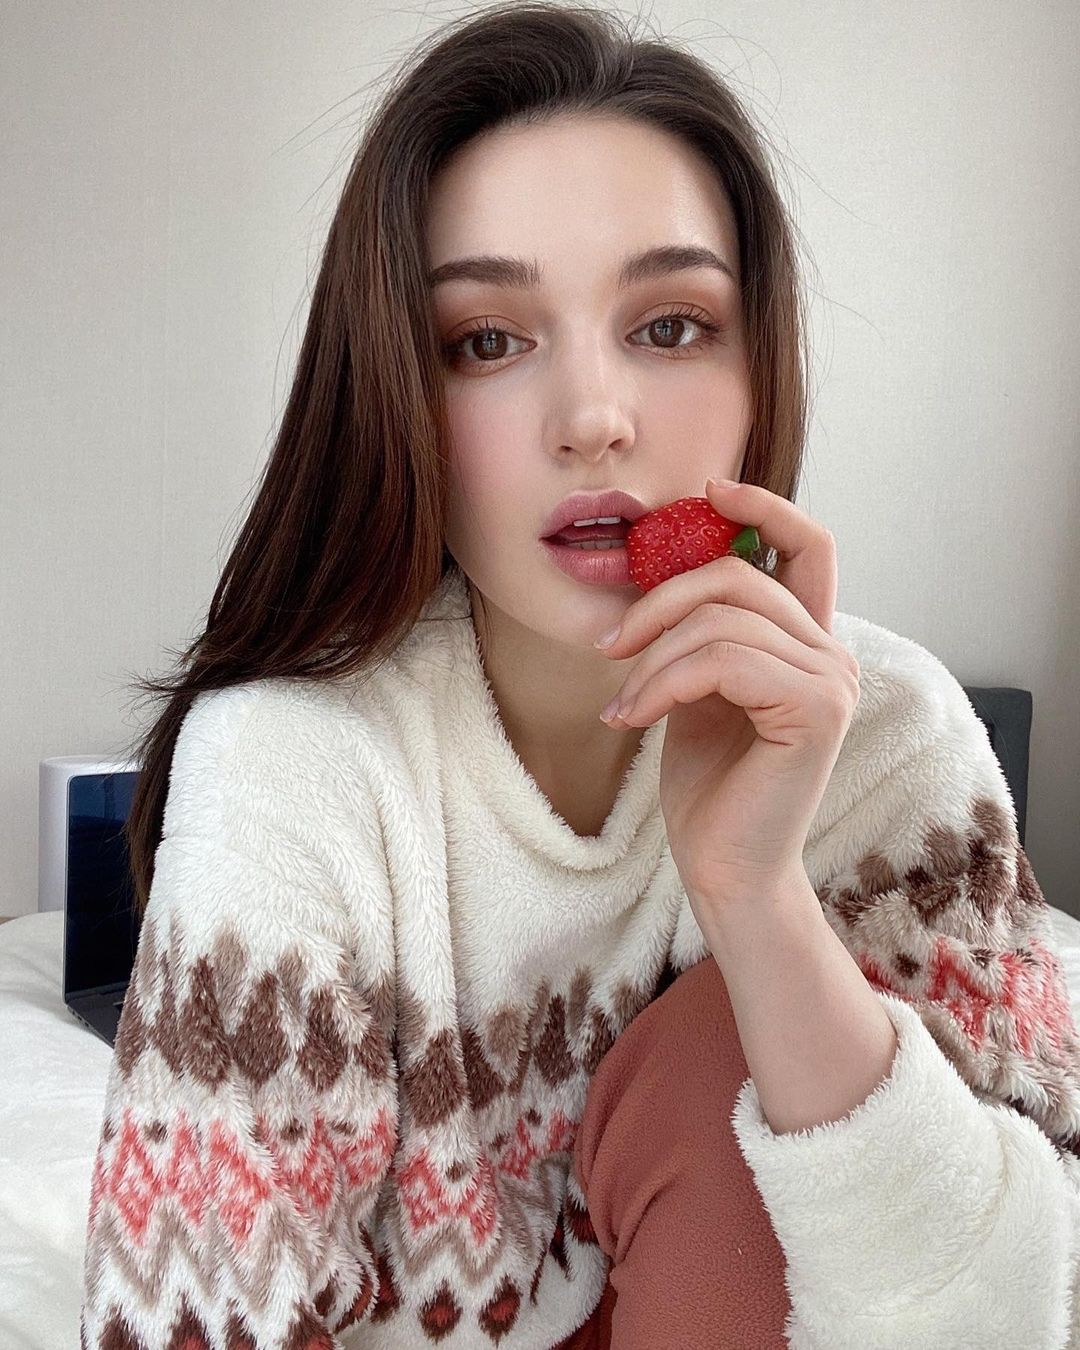 Anastasia-Jung-Wallpapers-Insta-Fit-Bio-12